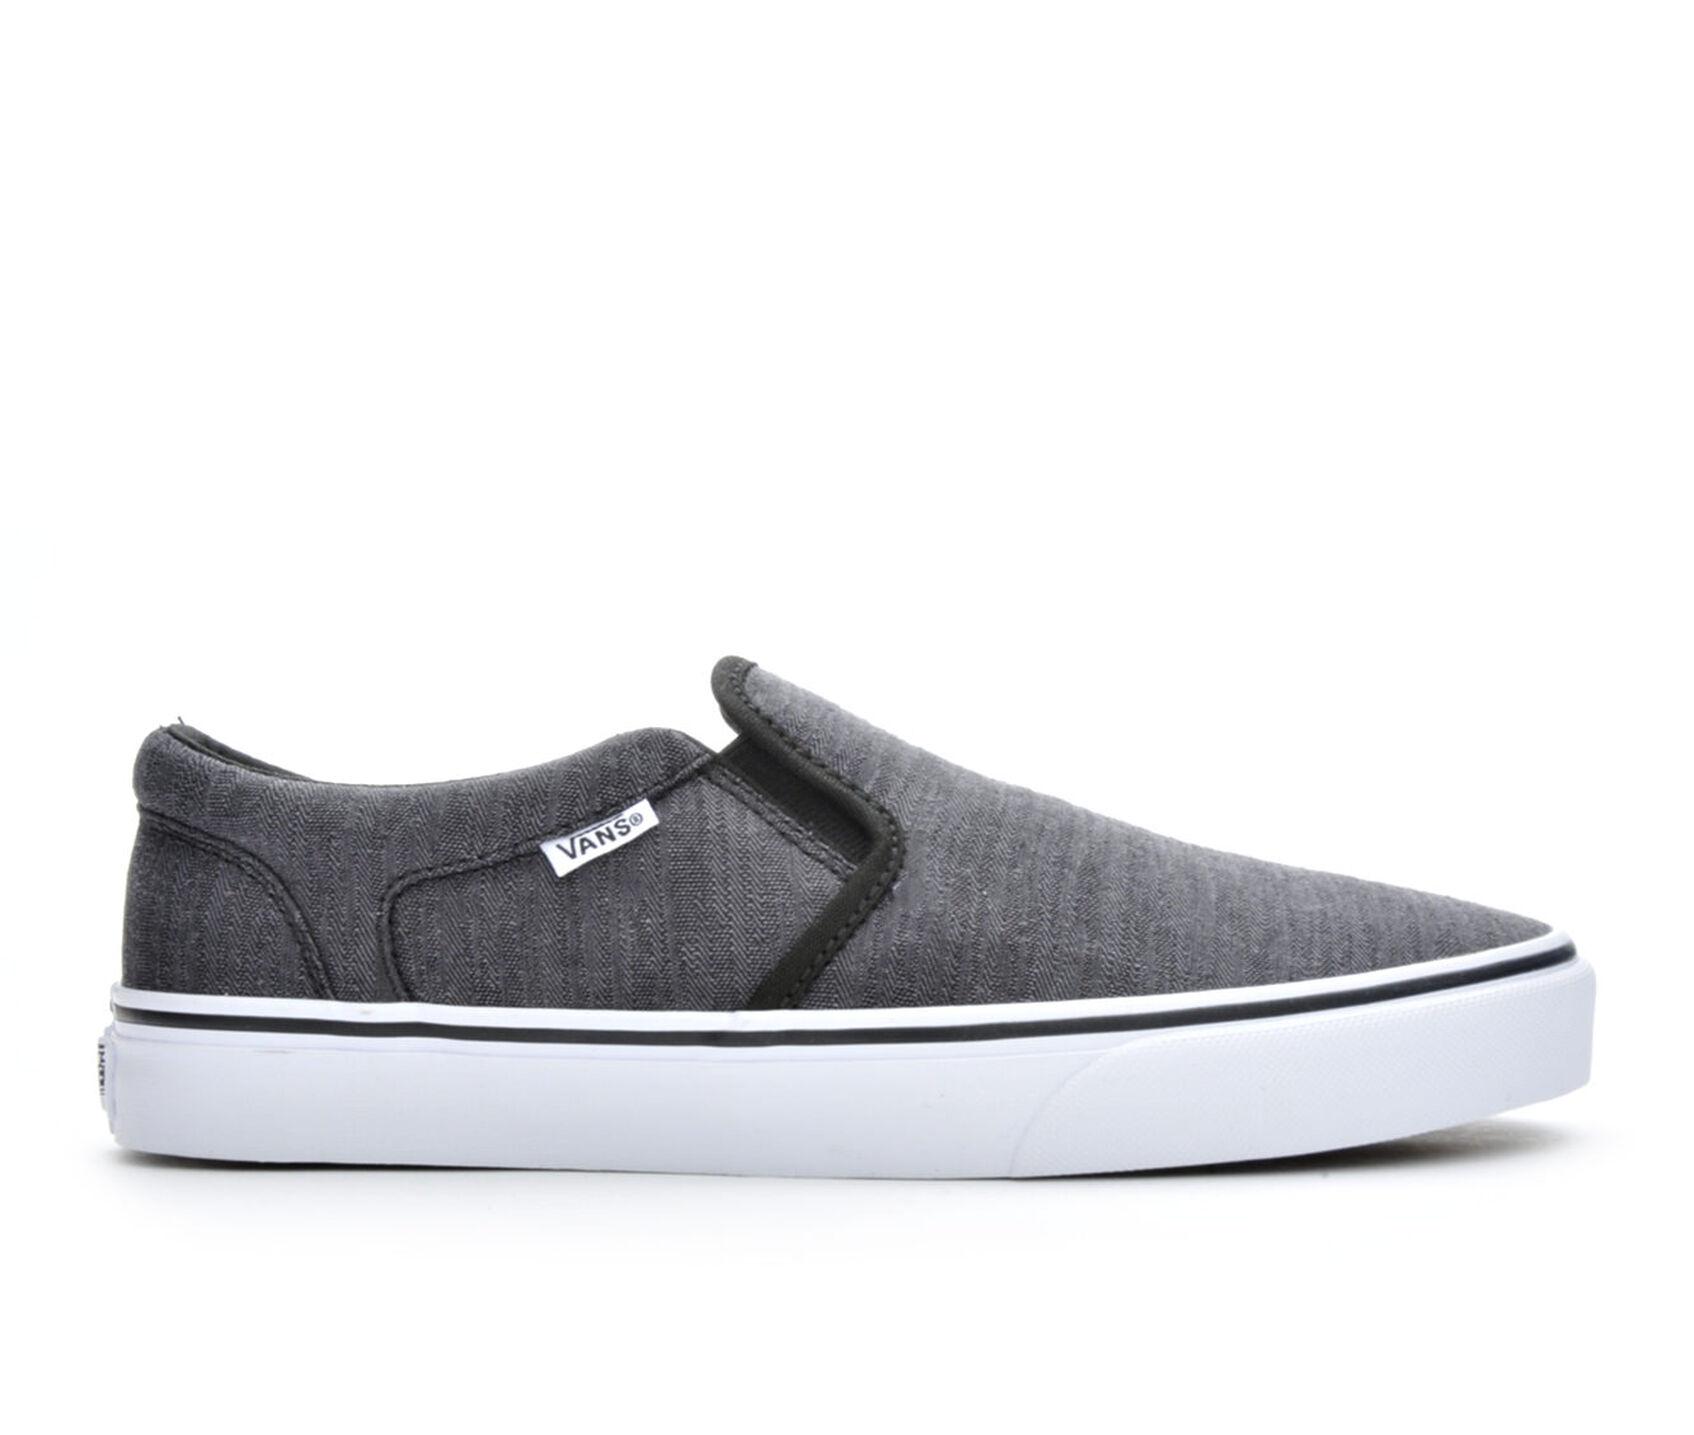 c6c0156e6dc ... Vans Asher Premium Slip-On Skate Shoes. Previous